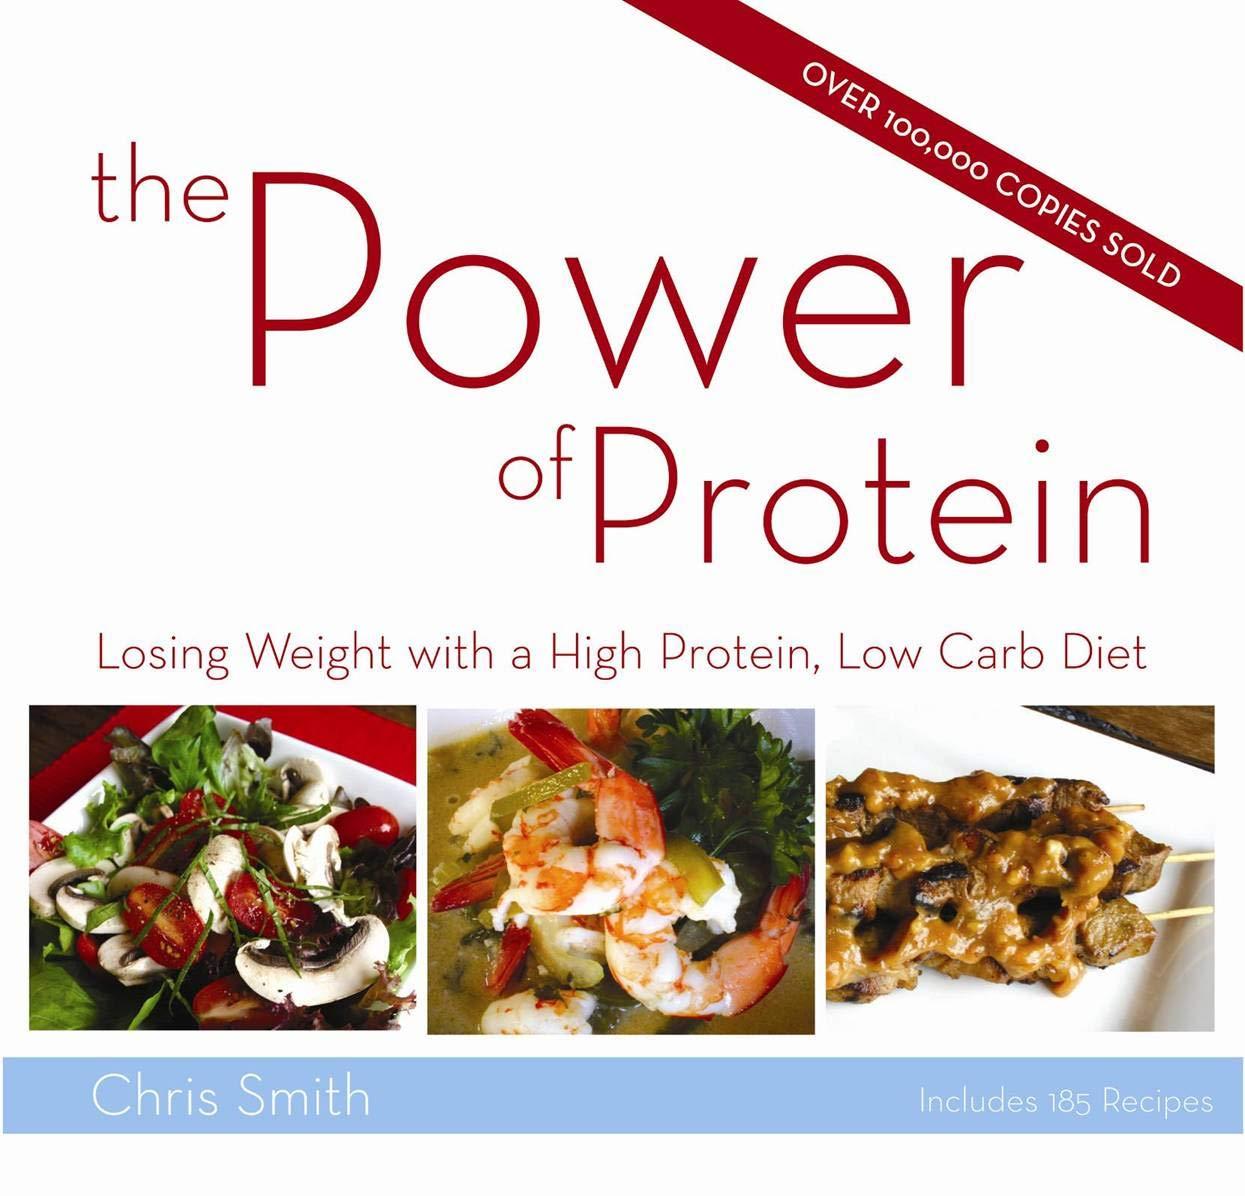 Power of Protein: Smith, Chris: 9781741105704: Amazon.com: Books